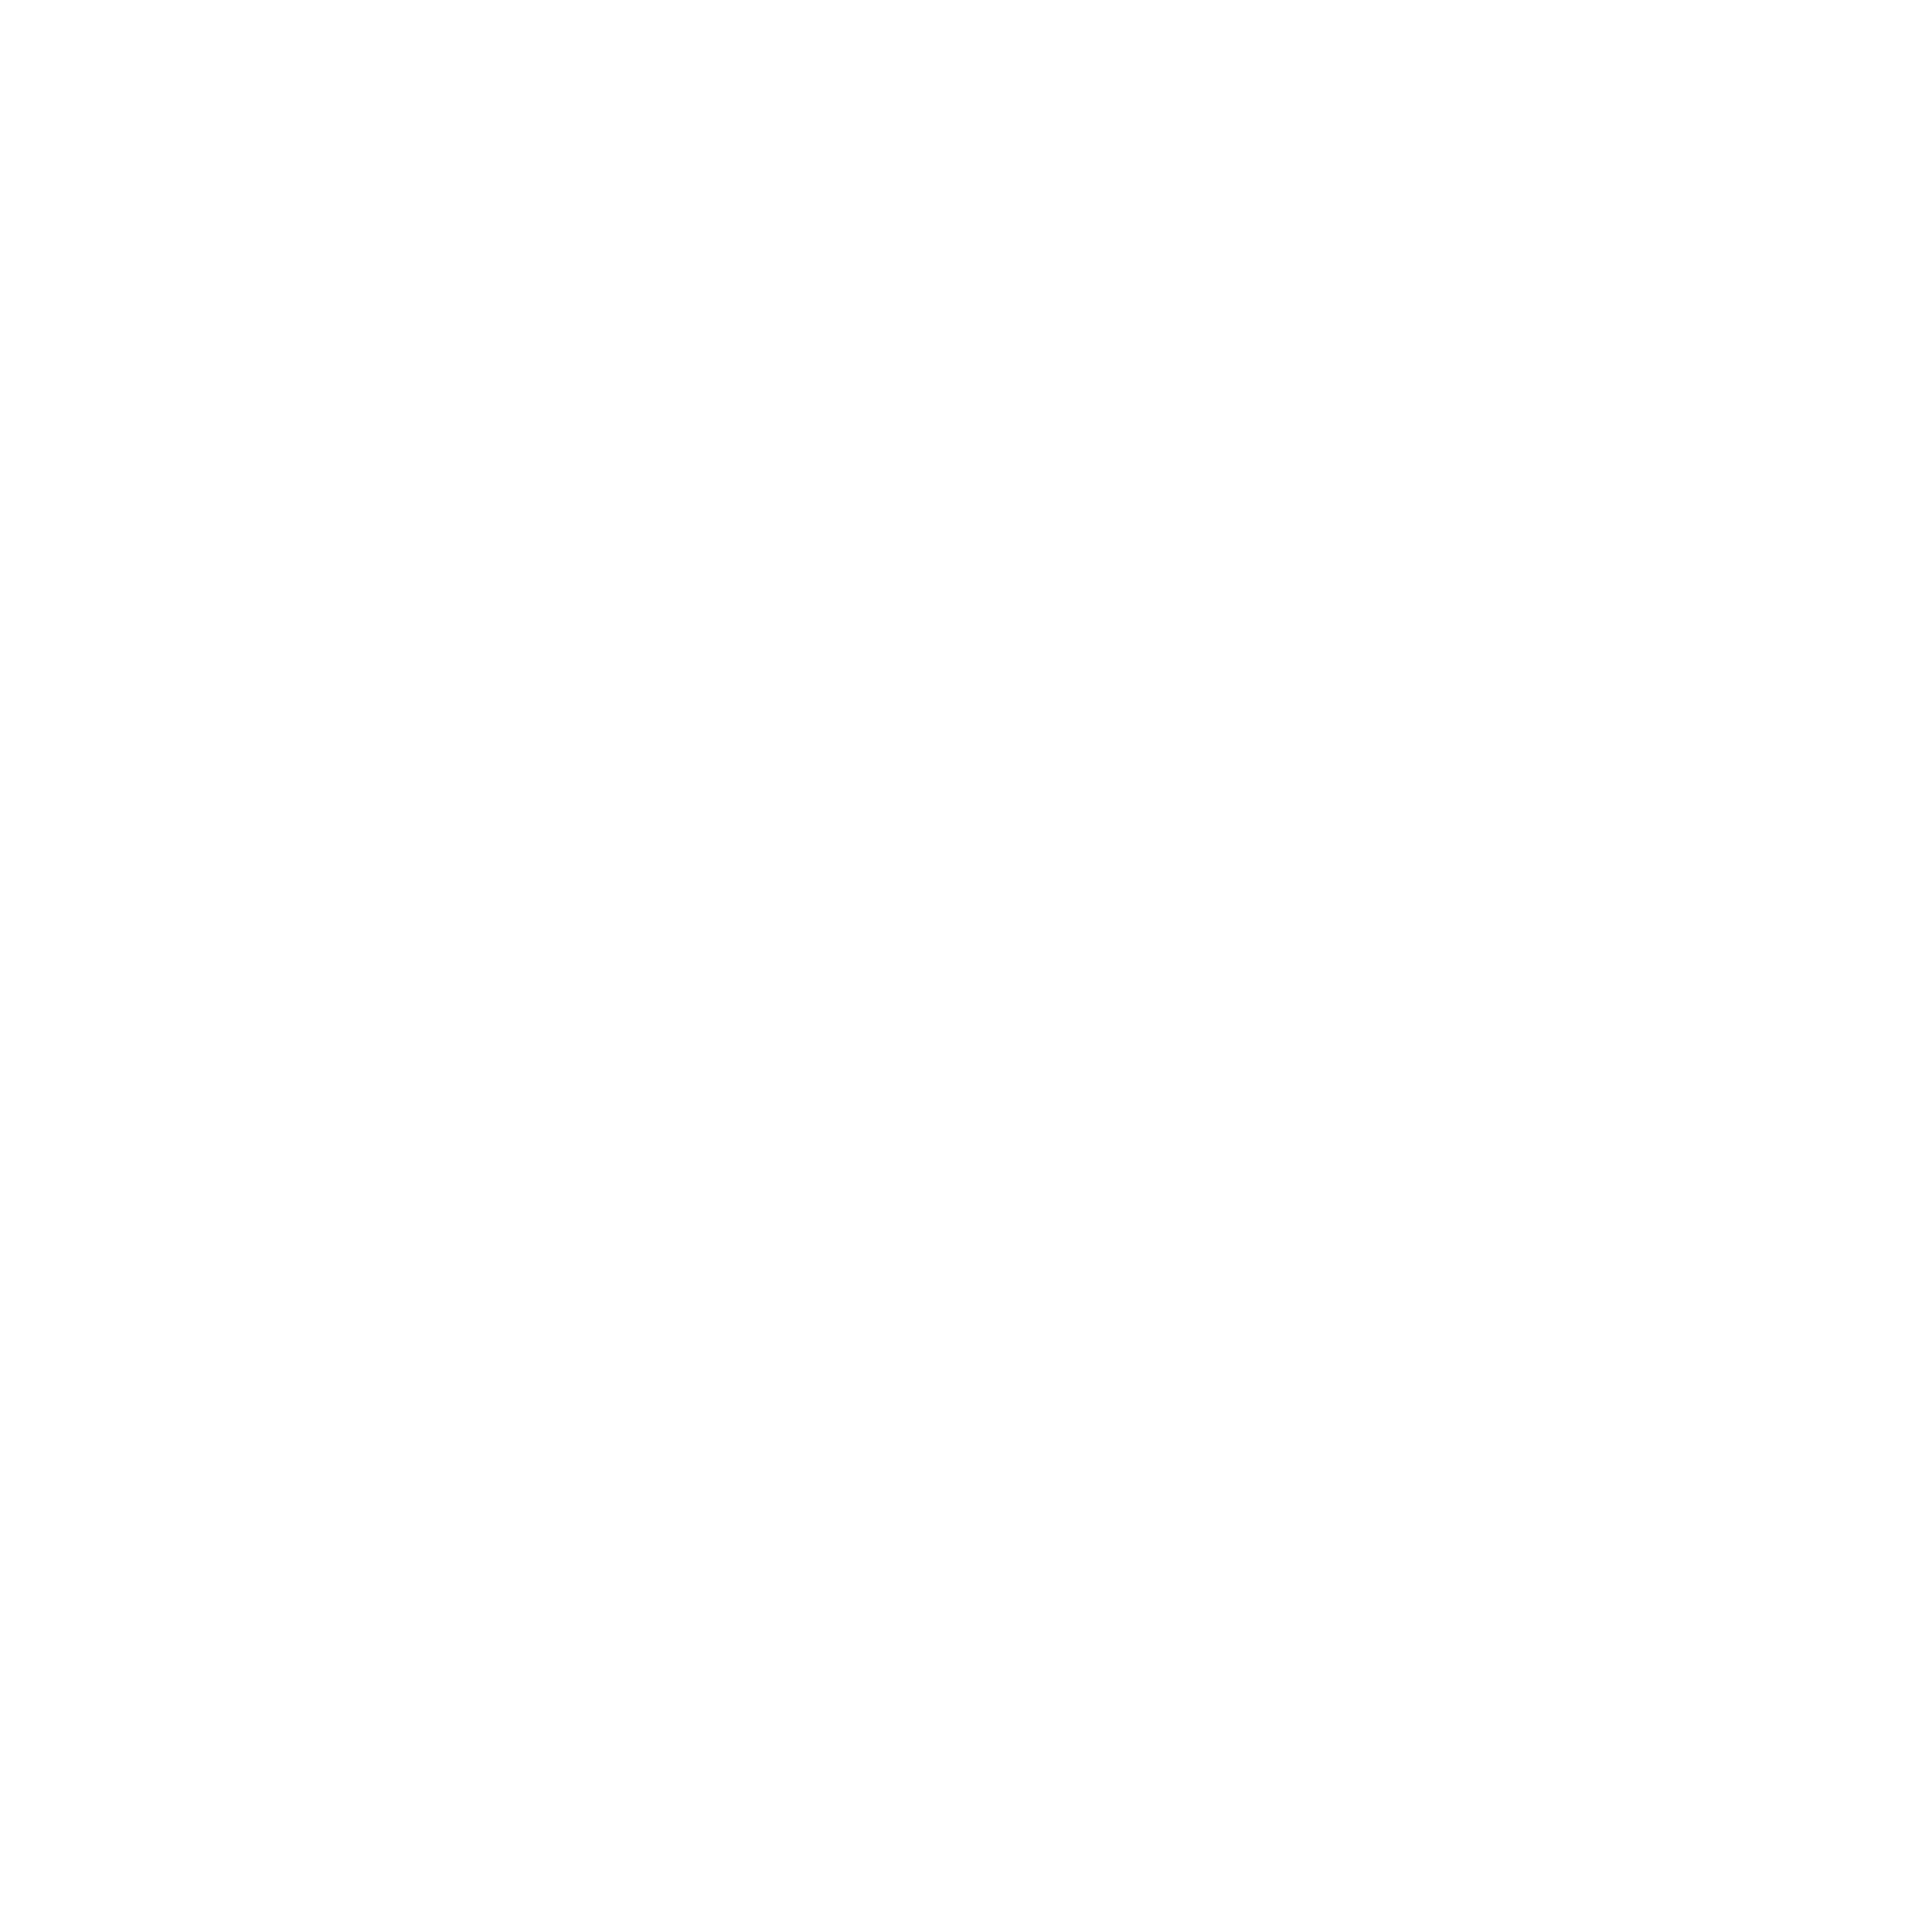 ALBA HOLIDAY COTTAGES LOGO